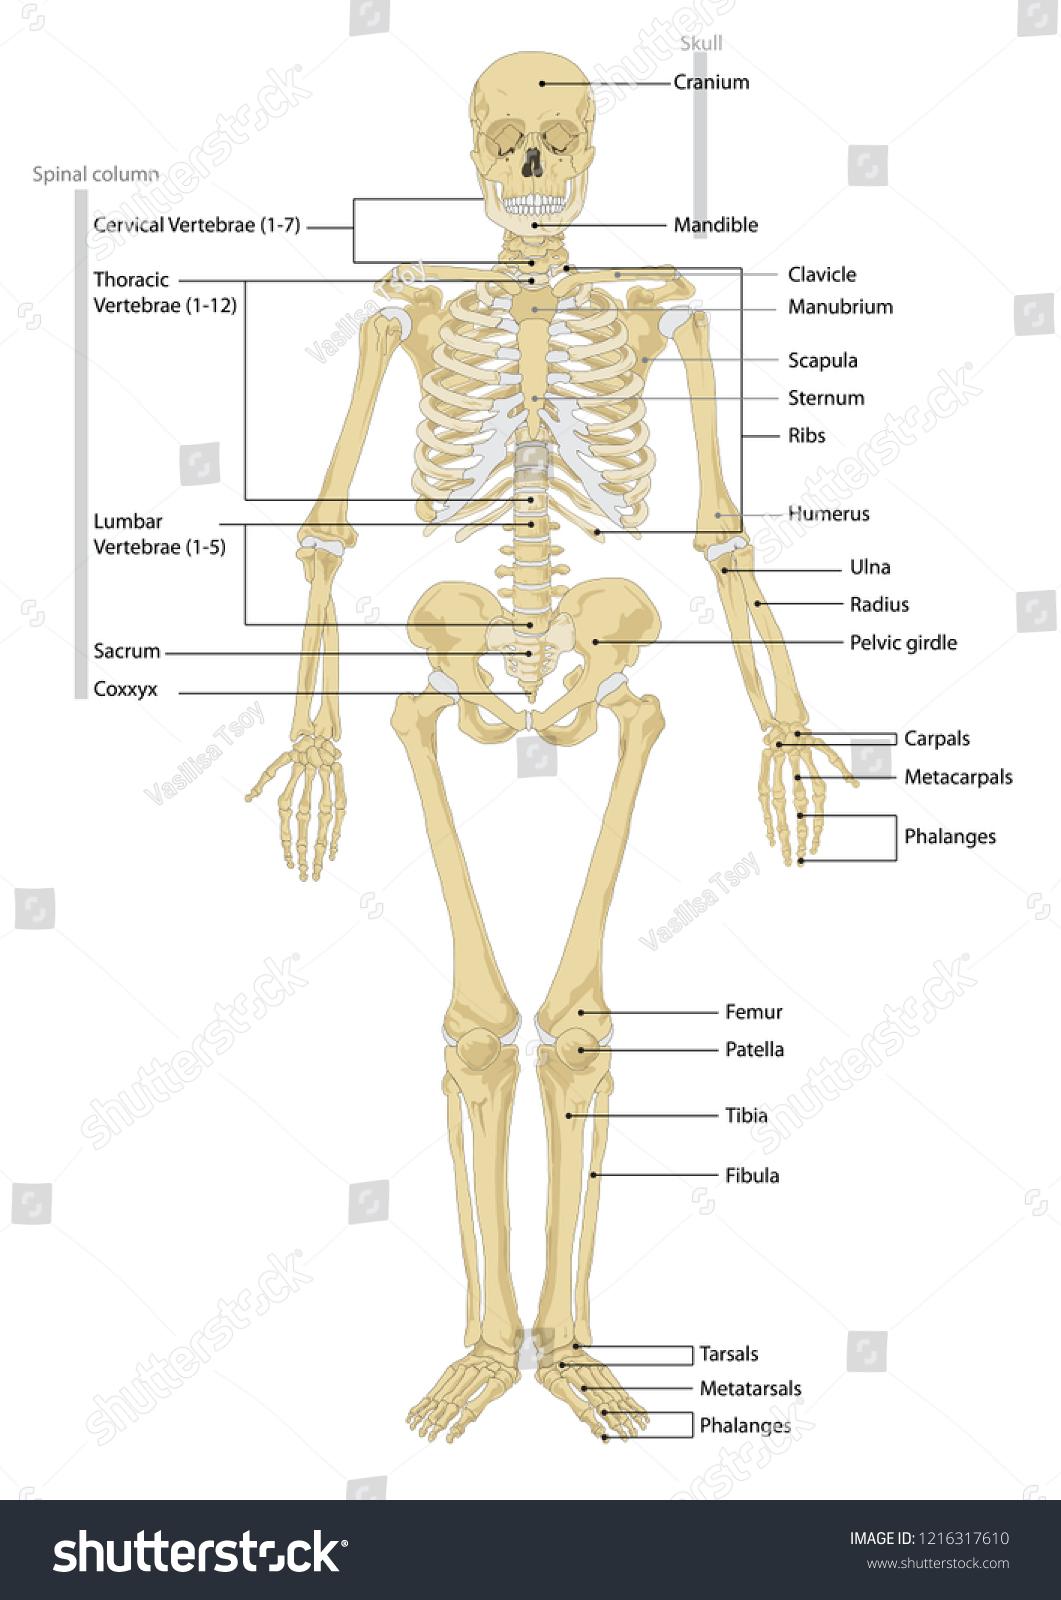 Human Skeleton Anatomy Scheme Vector Illustration Stock Vector